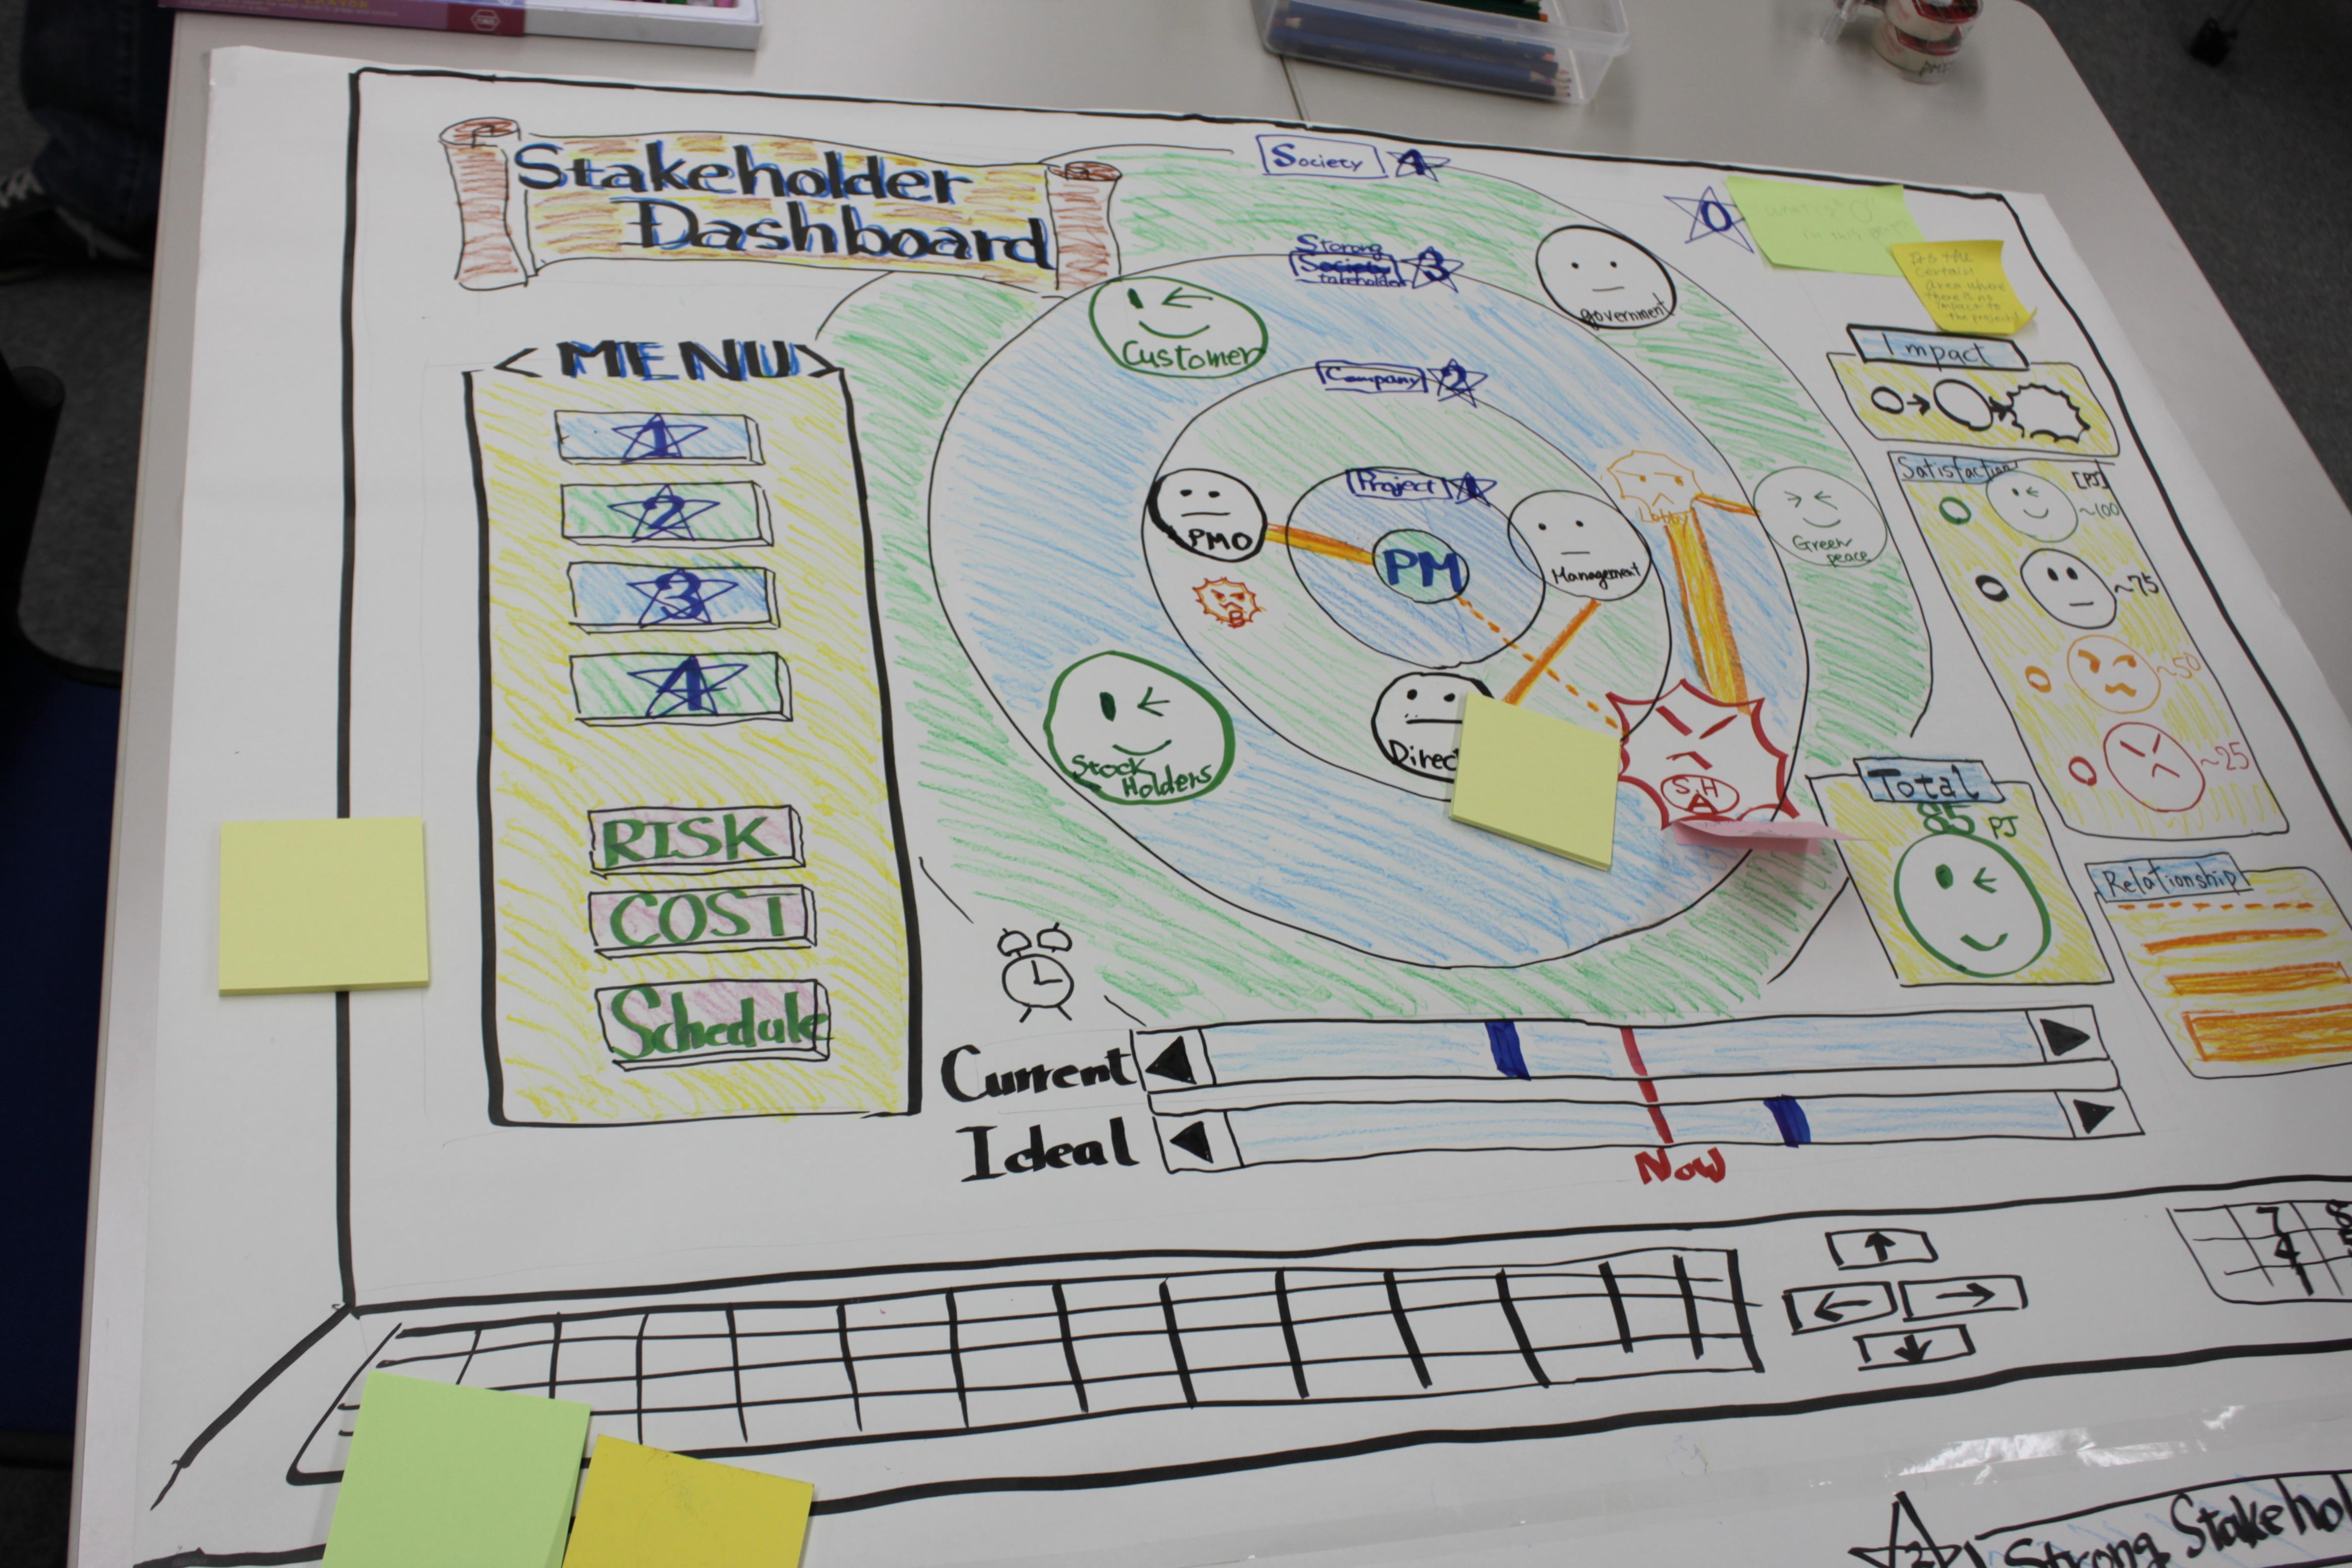 stakeholder_dashboard